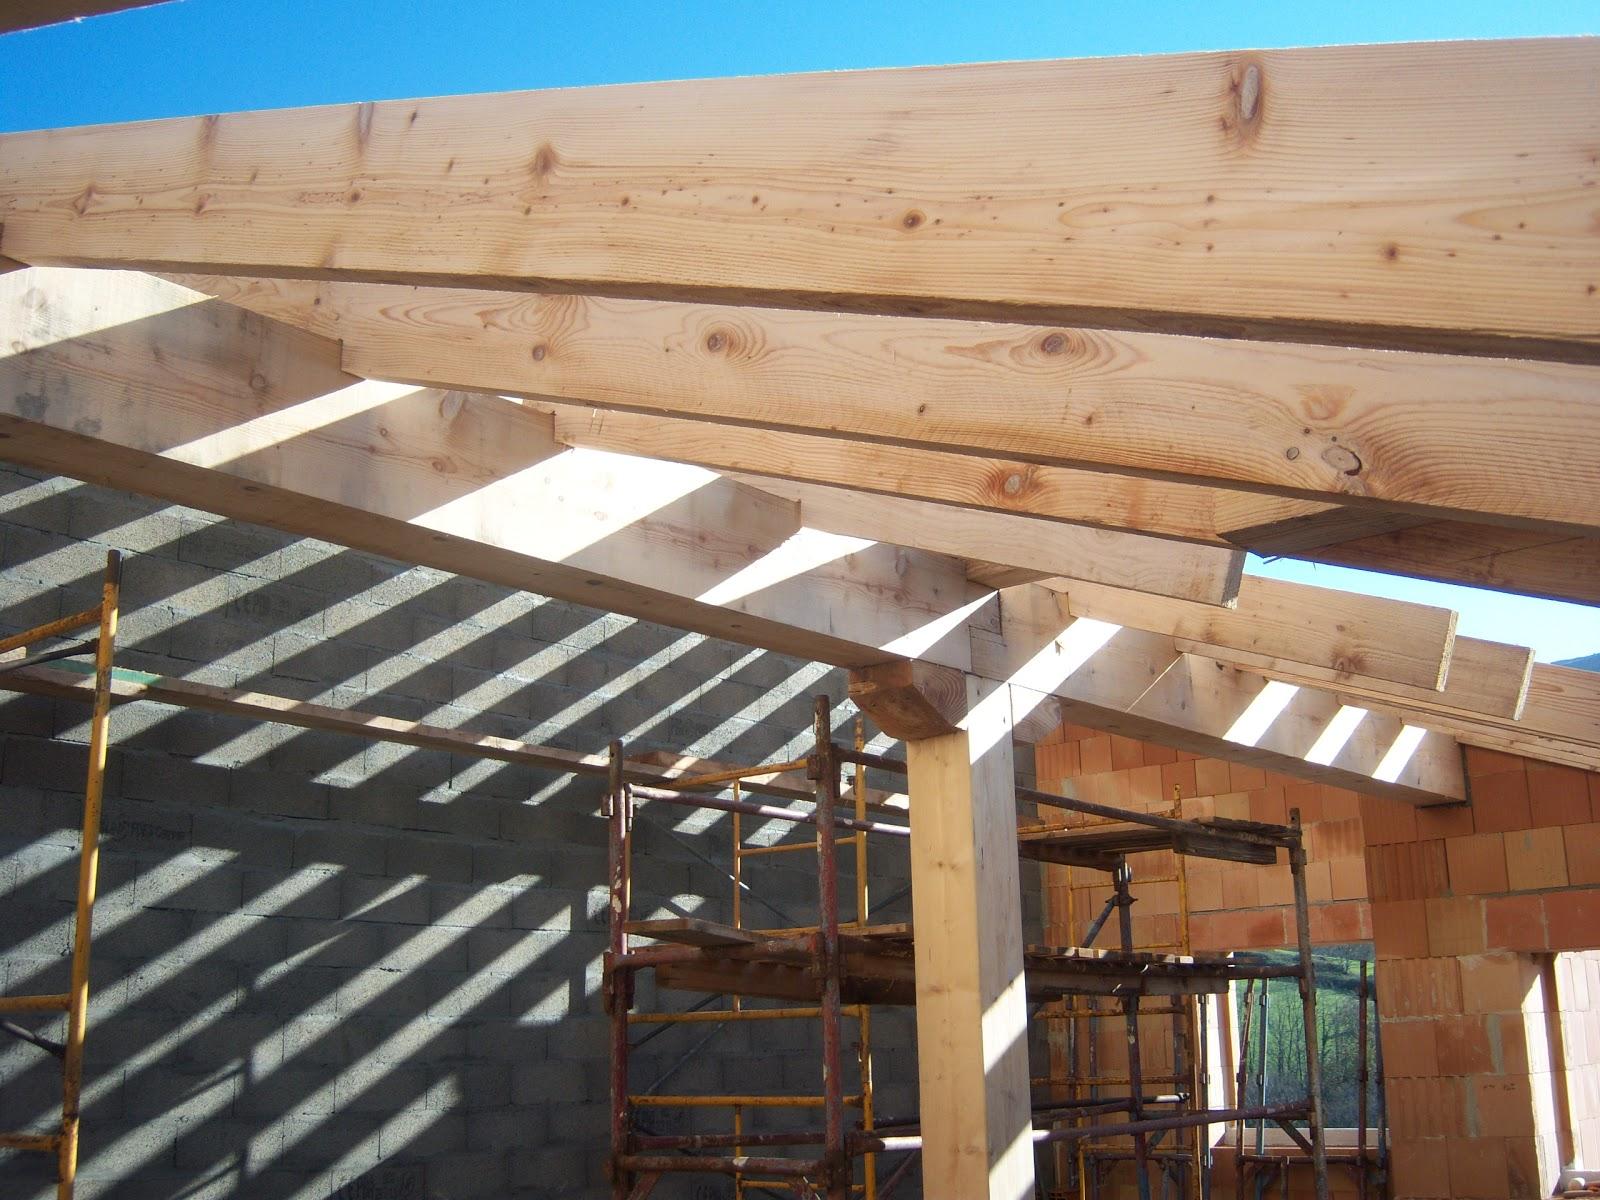 Andocarpinteando tejado con aislante de fibras de madera for Tejados de madera modernos